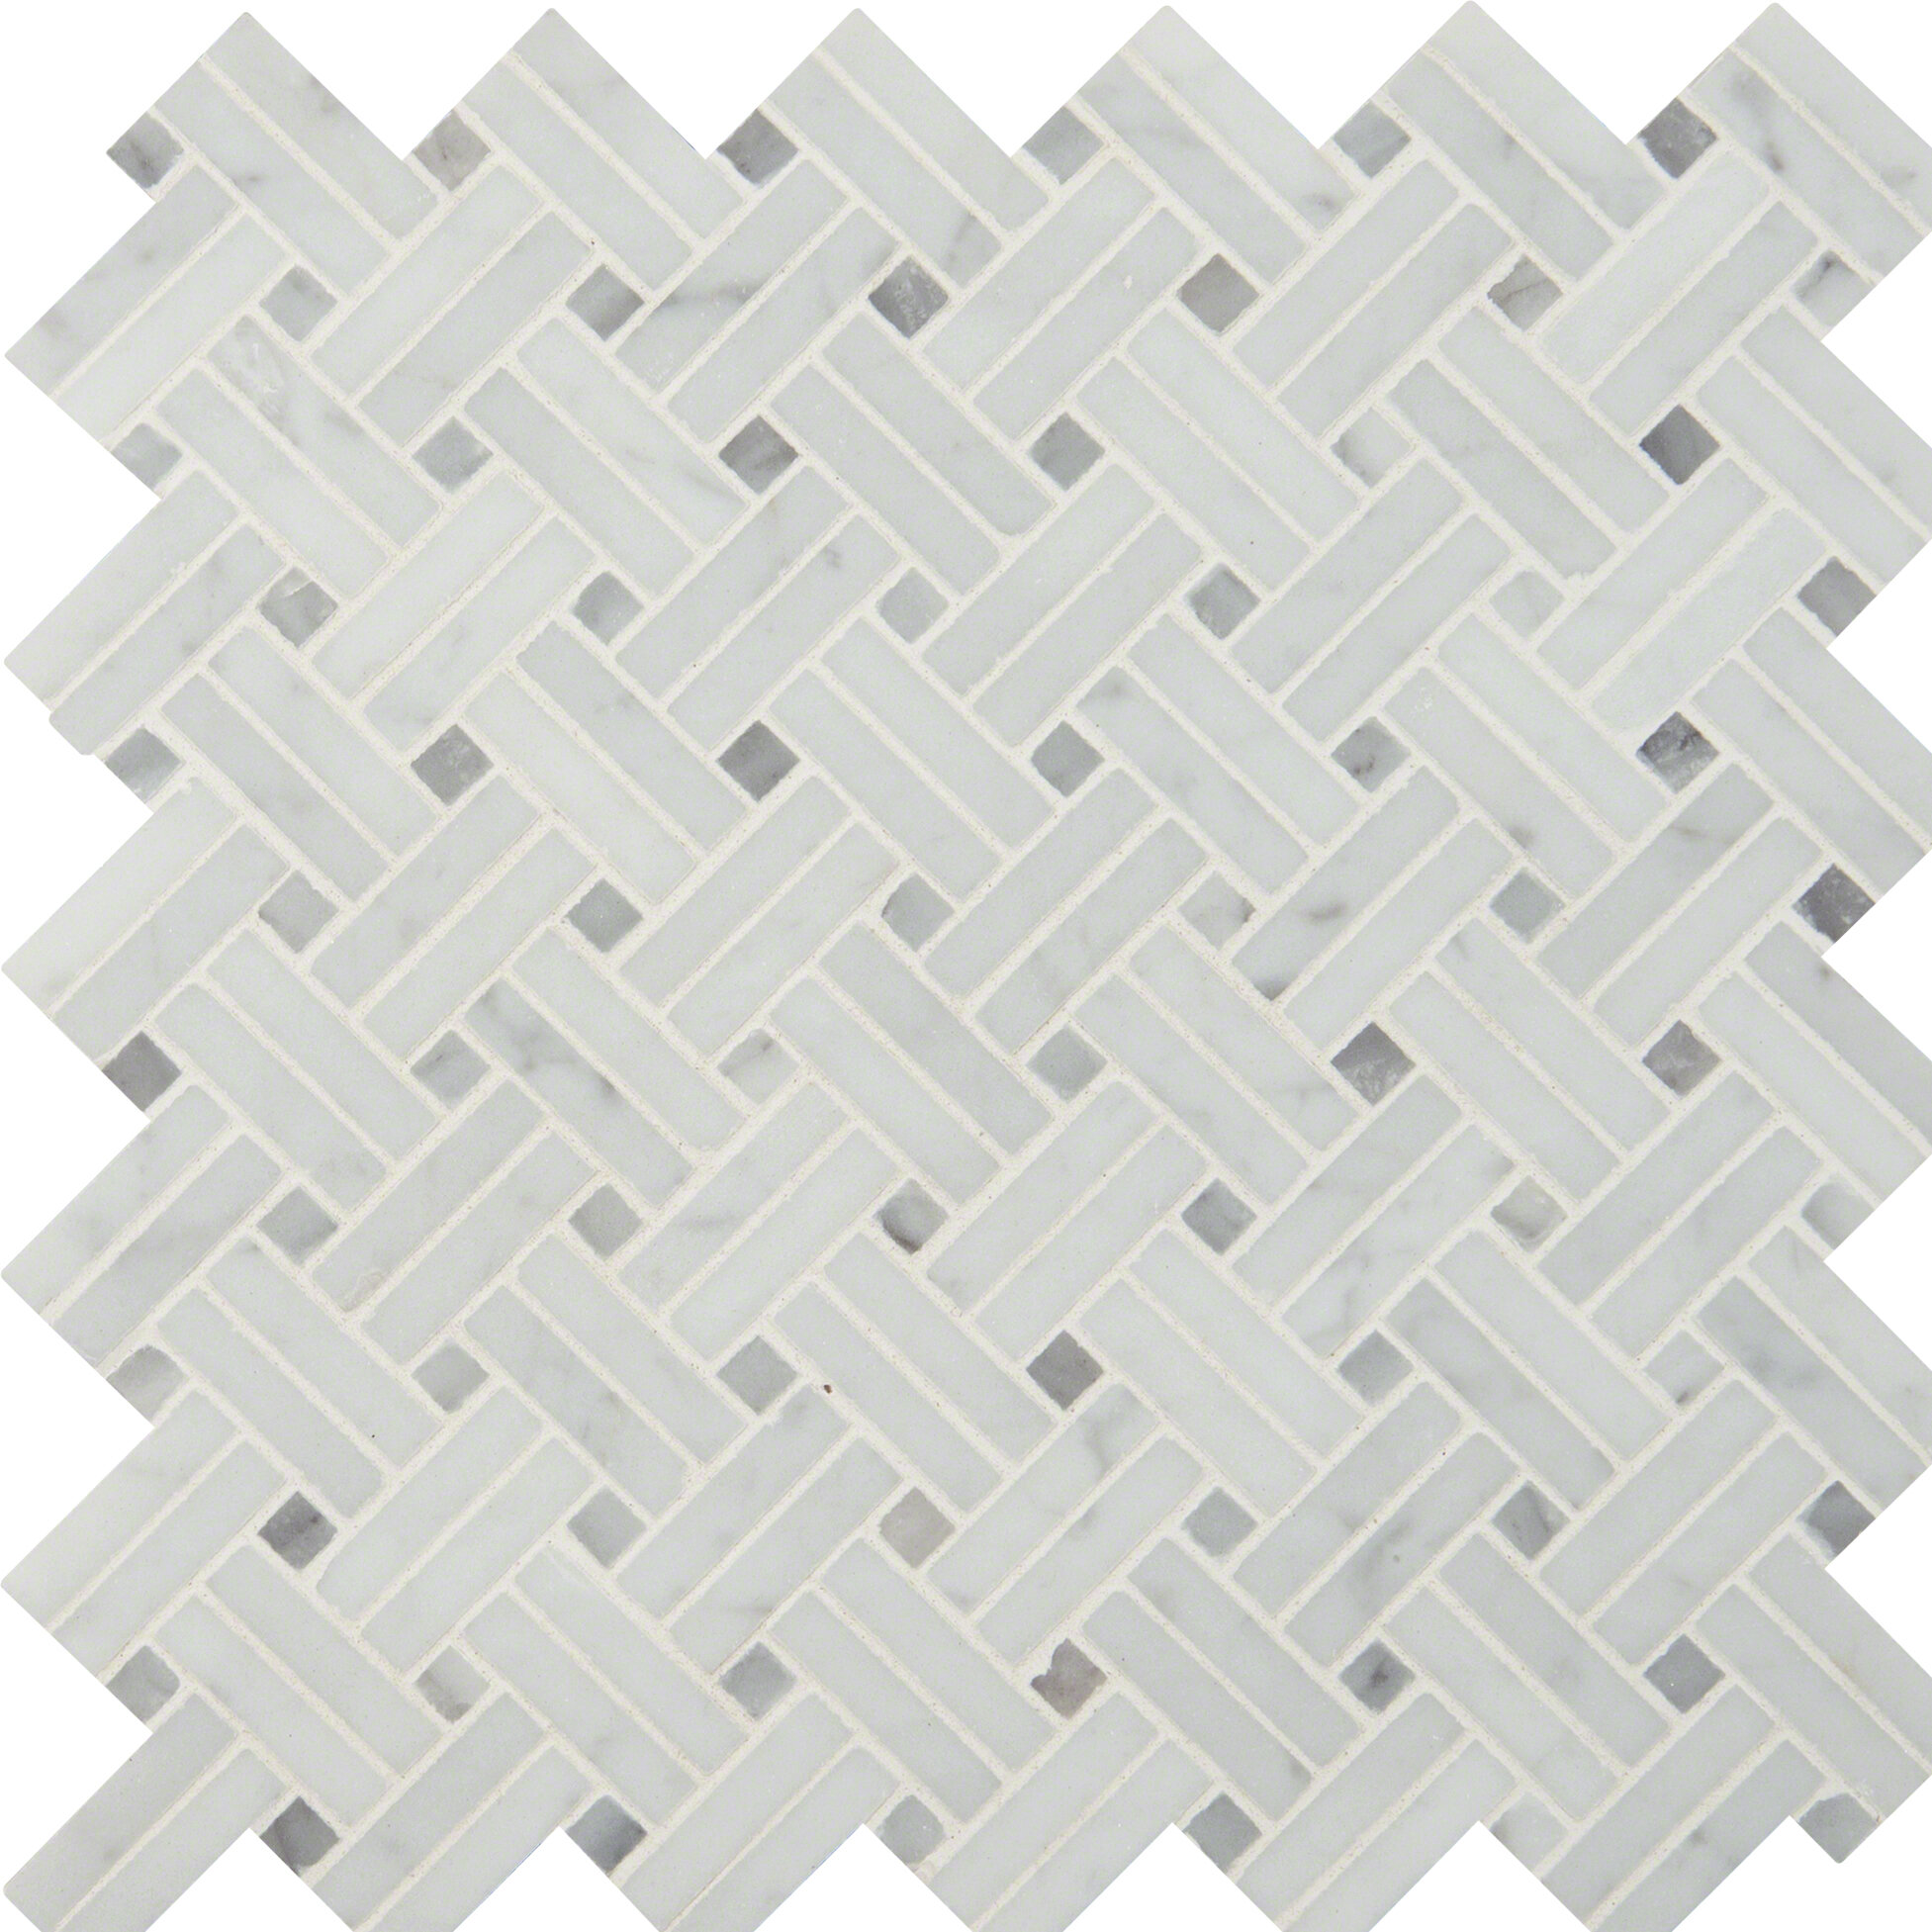 Msi basketweave polished marble mosaic tile in white wayfair dailygadgetfo Images